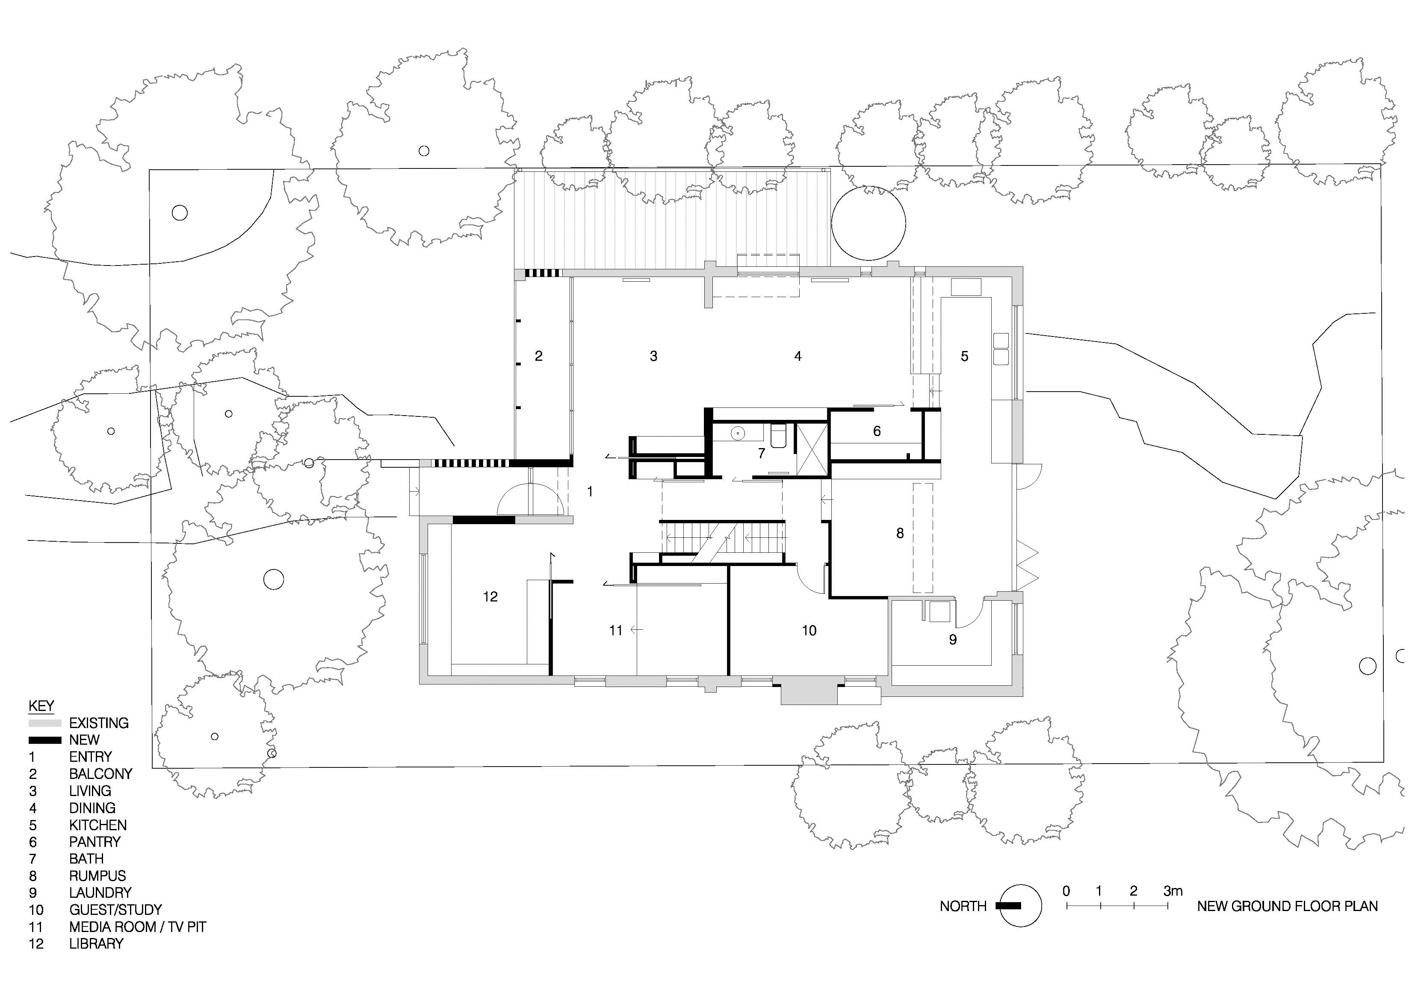 ruffey-lake-house-inbetween-architecture-the-design-emotive-39.jpg